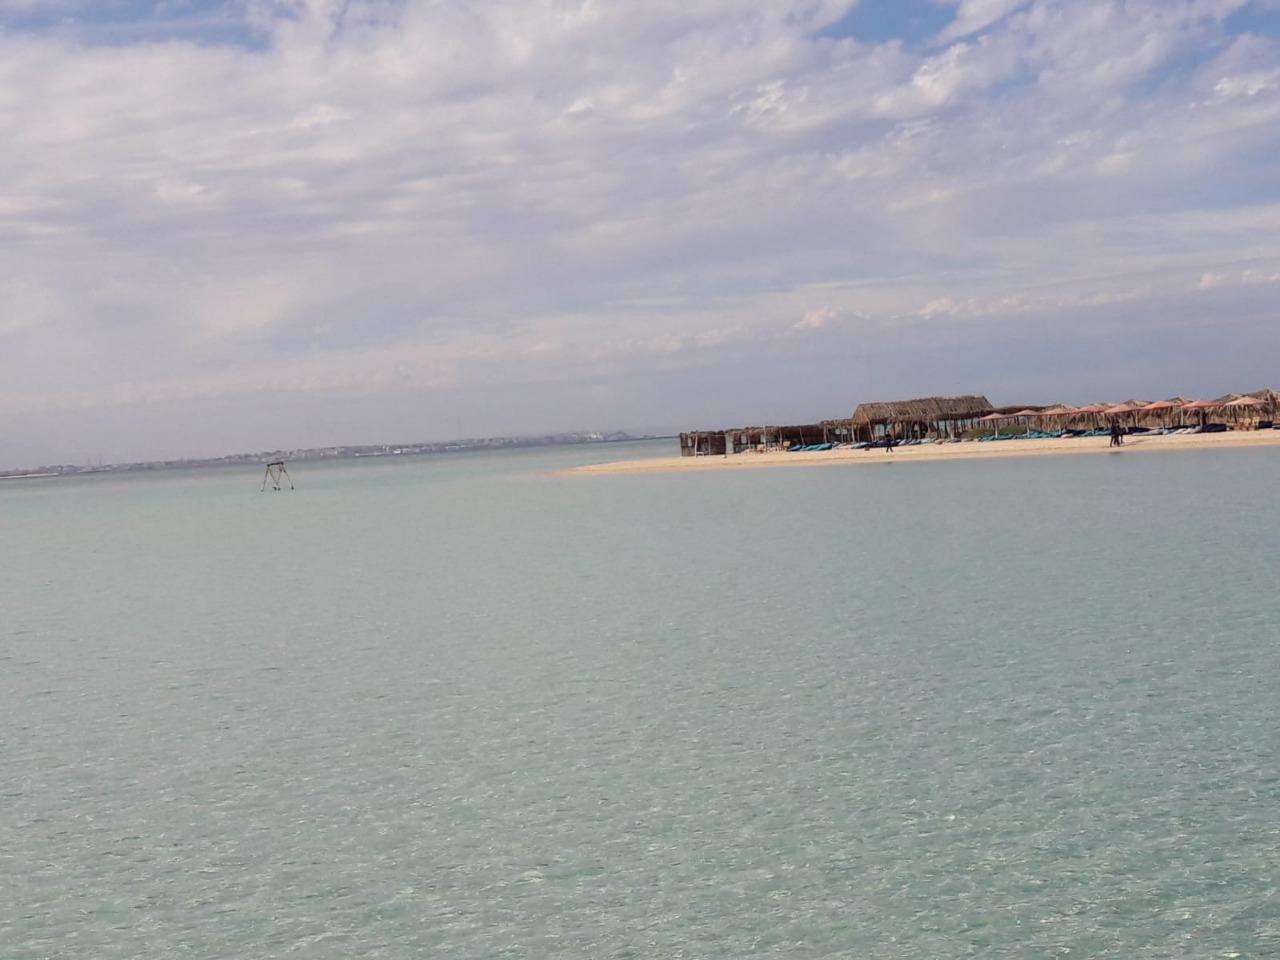 Ausflug zur Orange Bay - Schnorcheln am Karibik Strand ab Soma Bay/Safaga